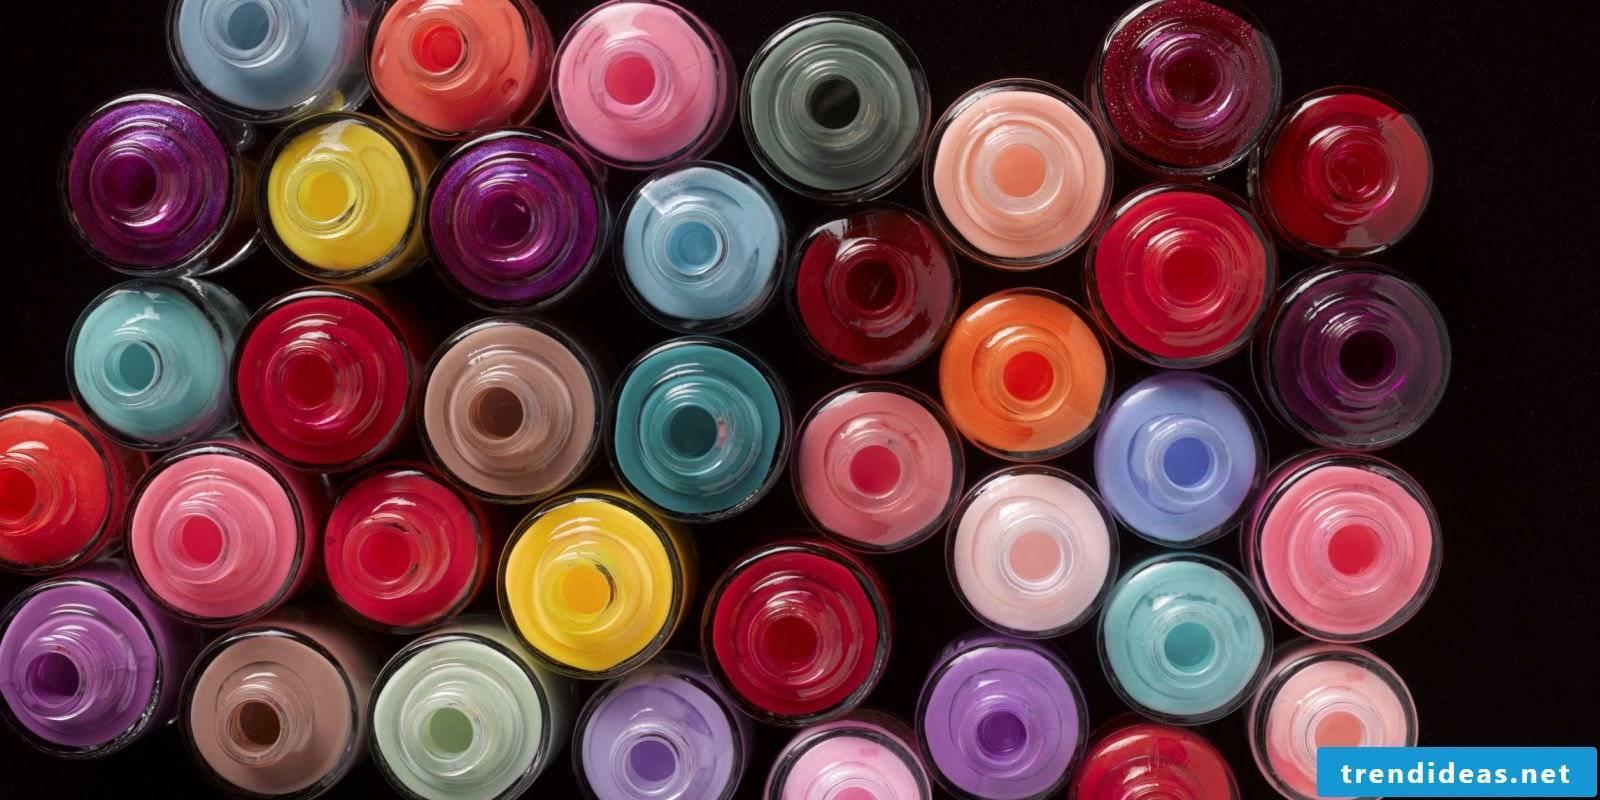 Nail design to make yourself with nail polish